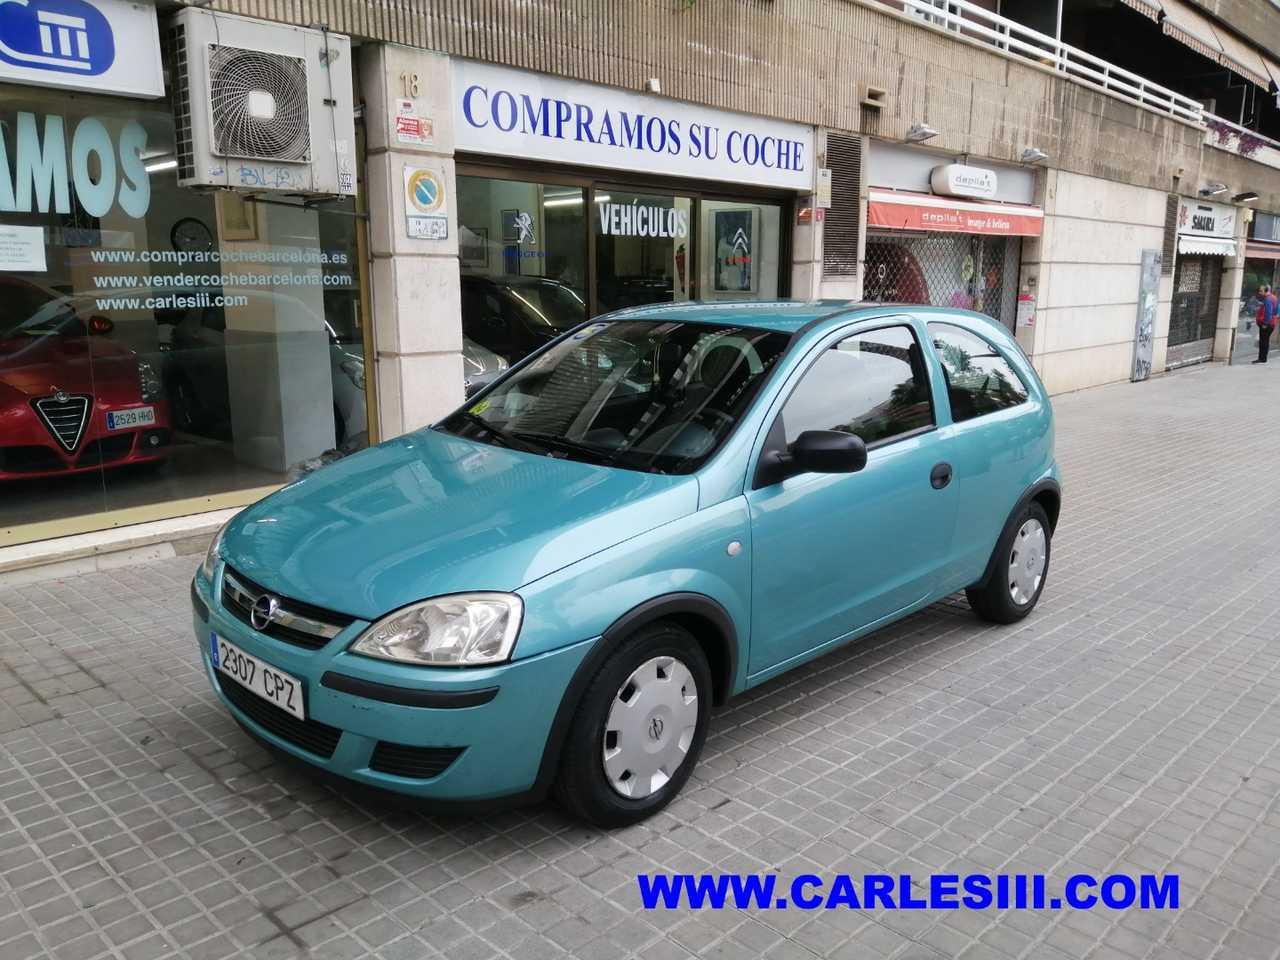 Opel Corsa 1.2 16v   - Foto 1